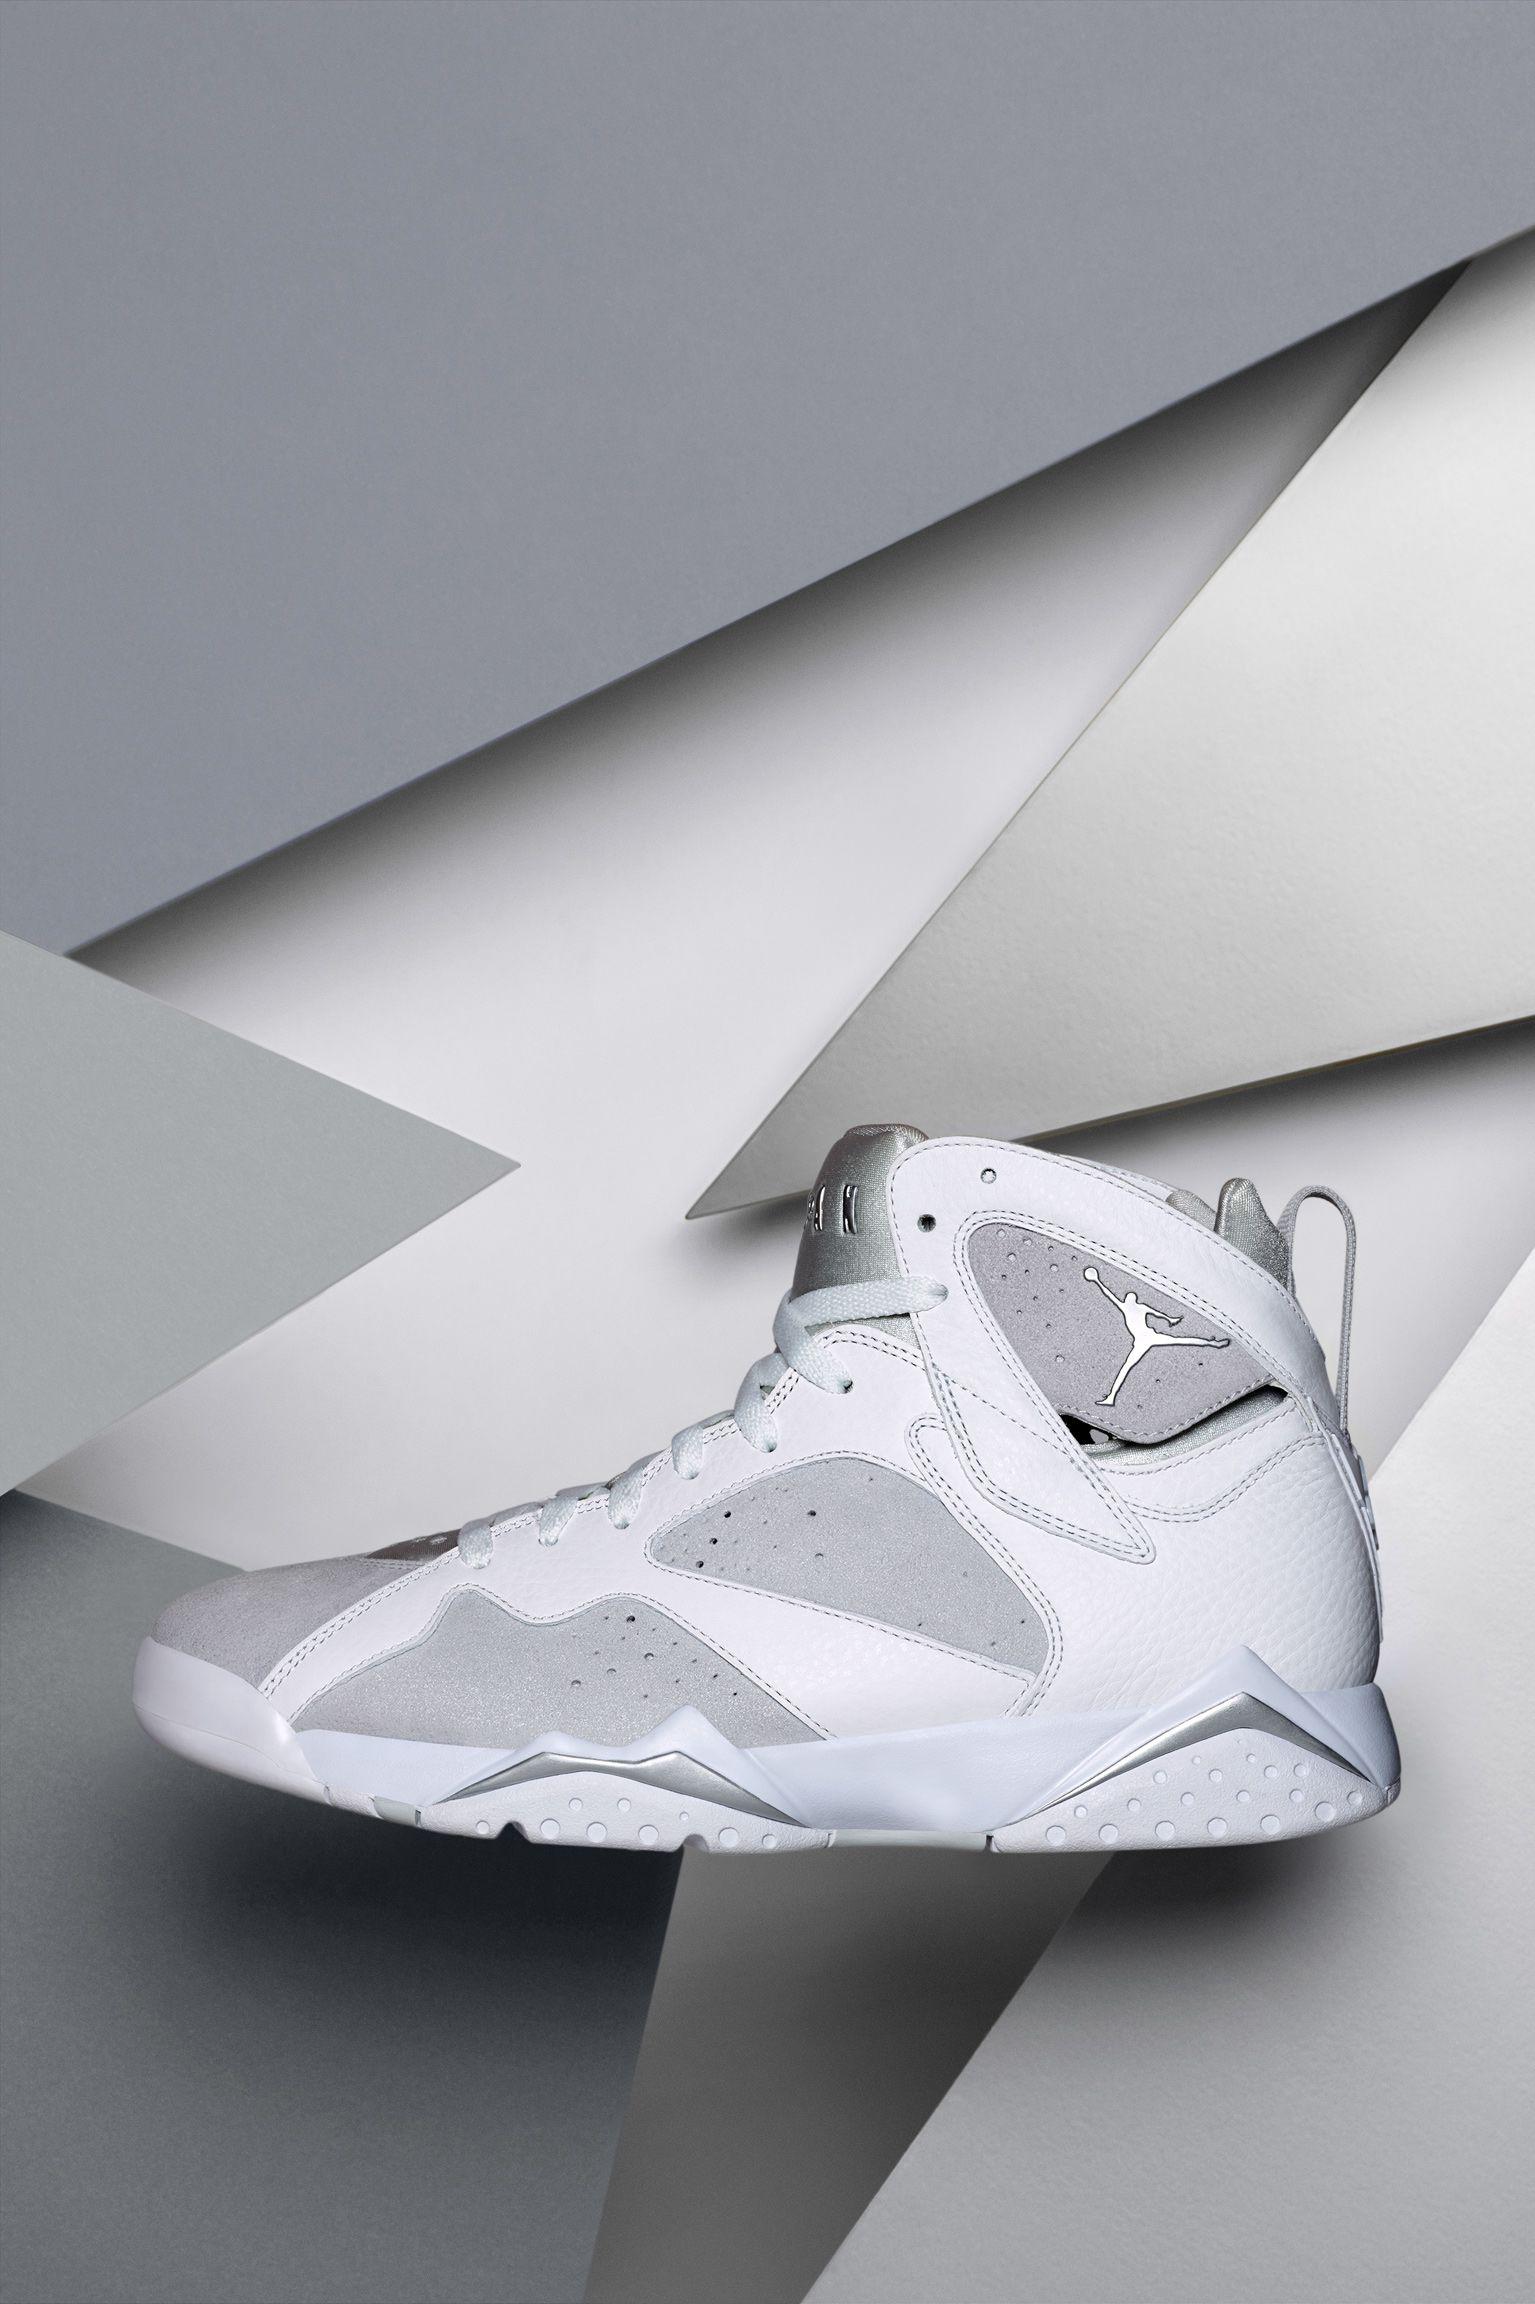 Air Jordan 7 Retro  White   Pure Platinum  Release Date. Nike+ SNKRS f5db836f6a5b